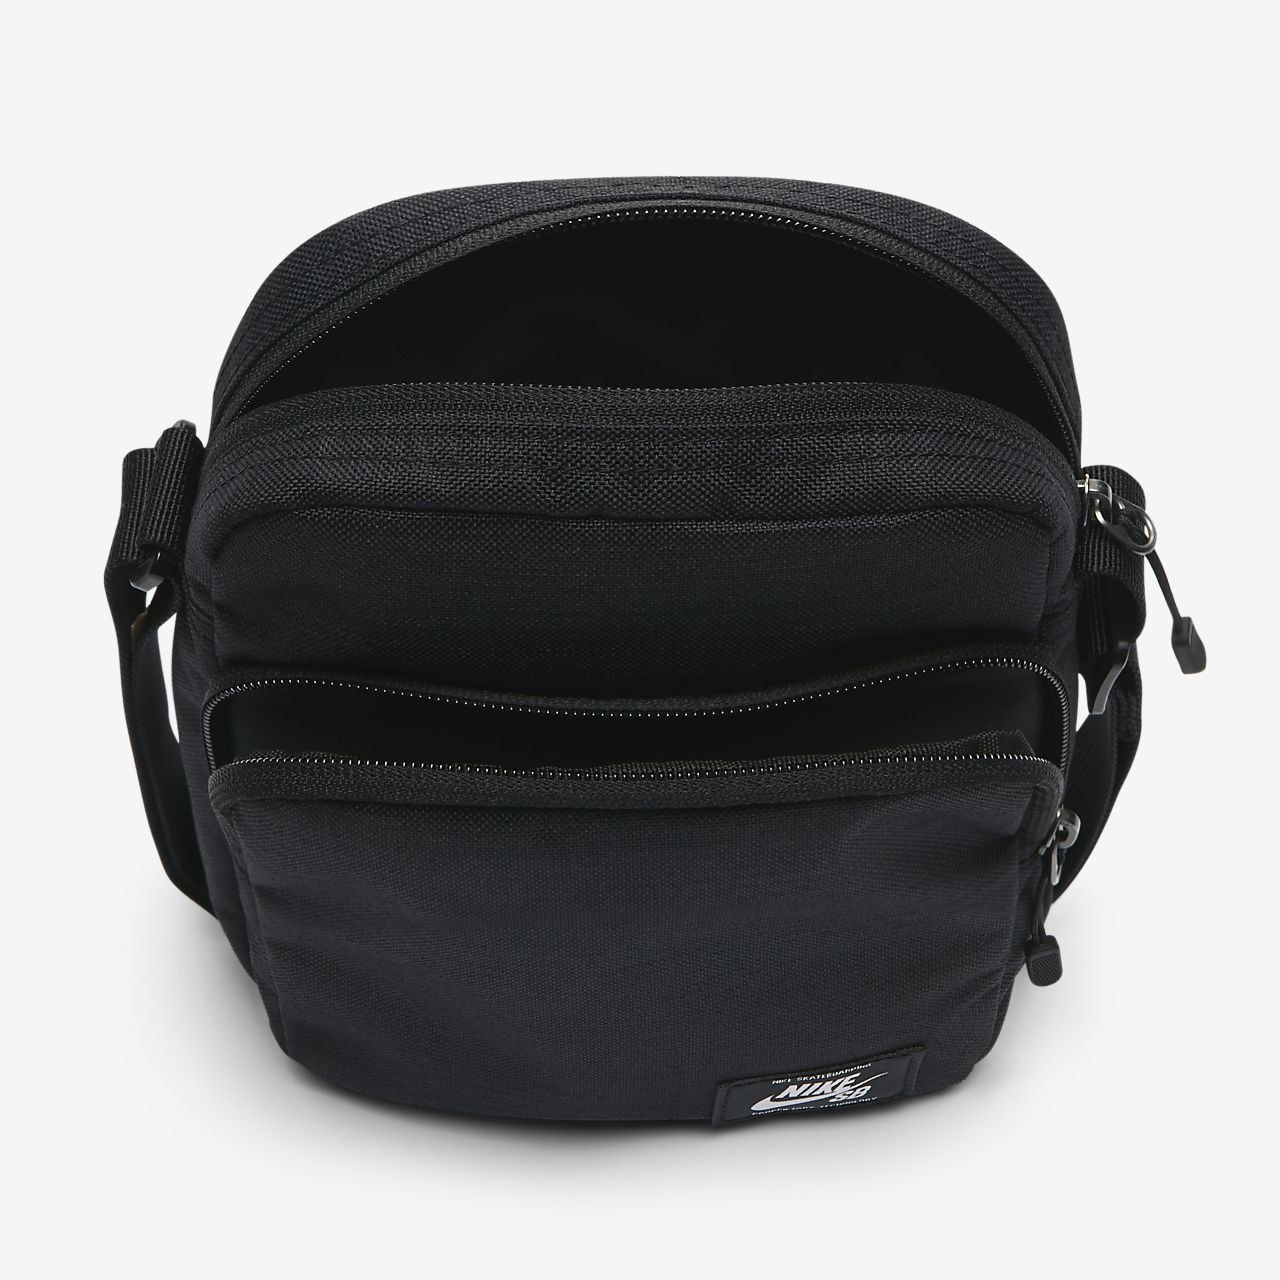 72078c685bcd Nike SB Heritage Small Items Bag. Nike.com